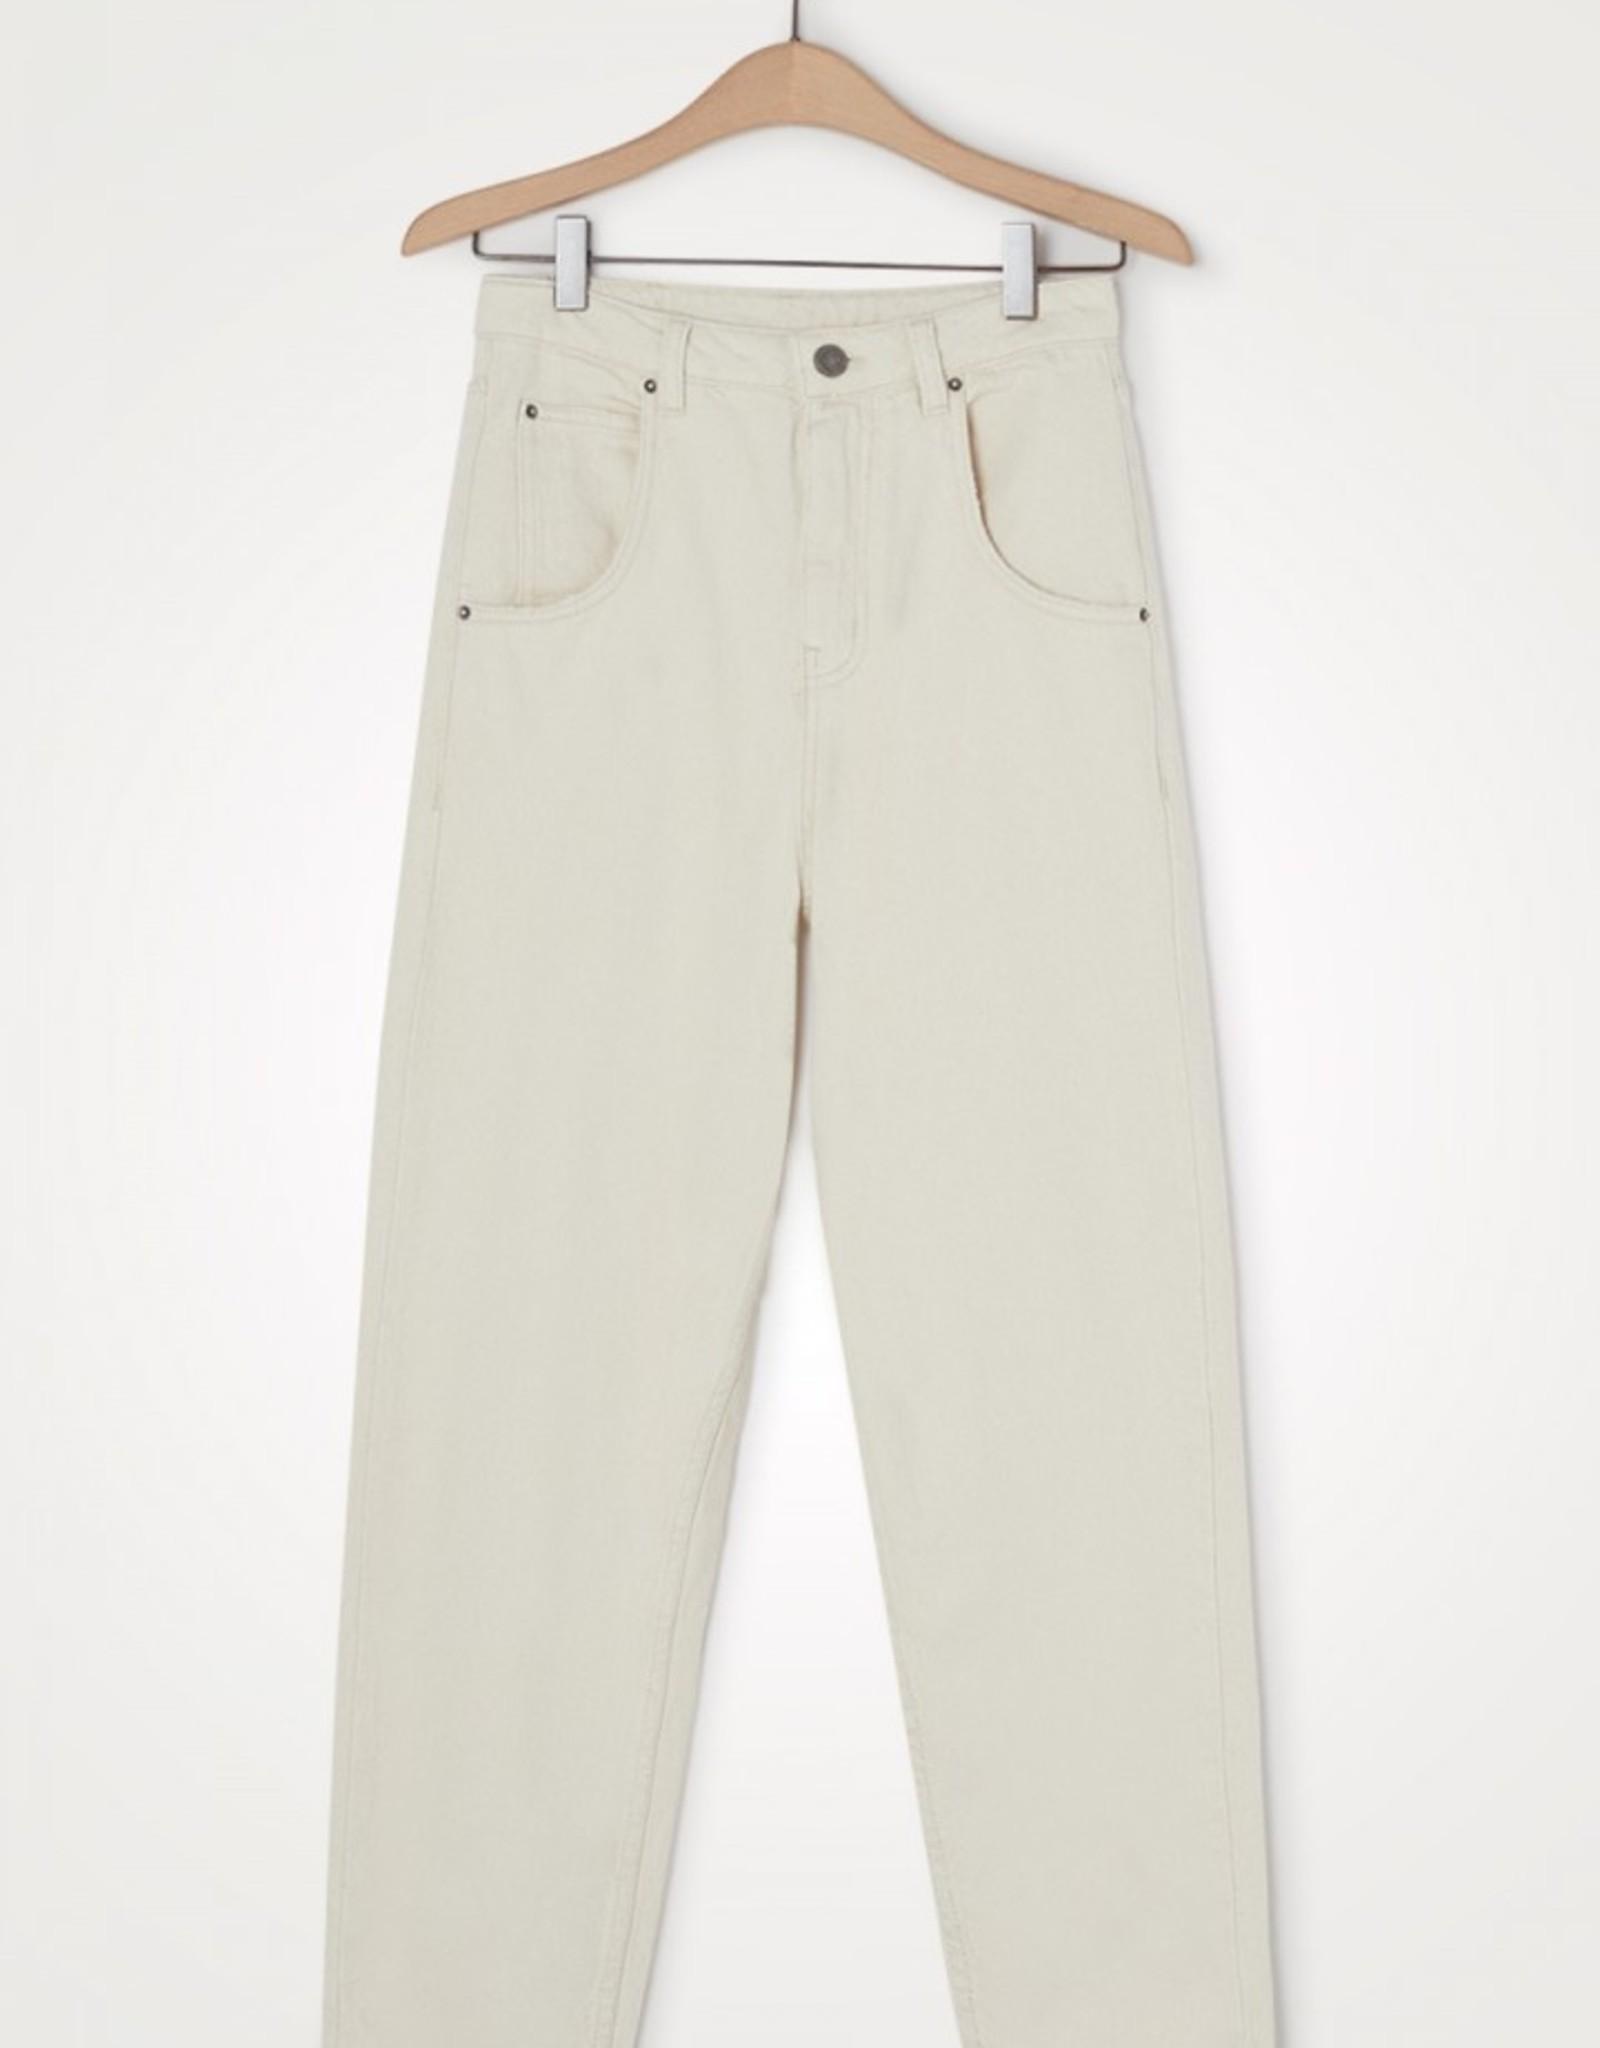 Akami Pants